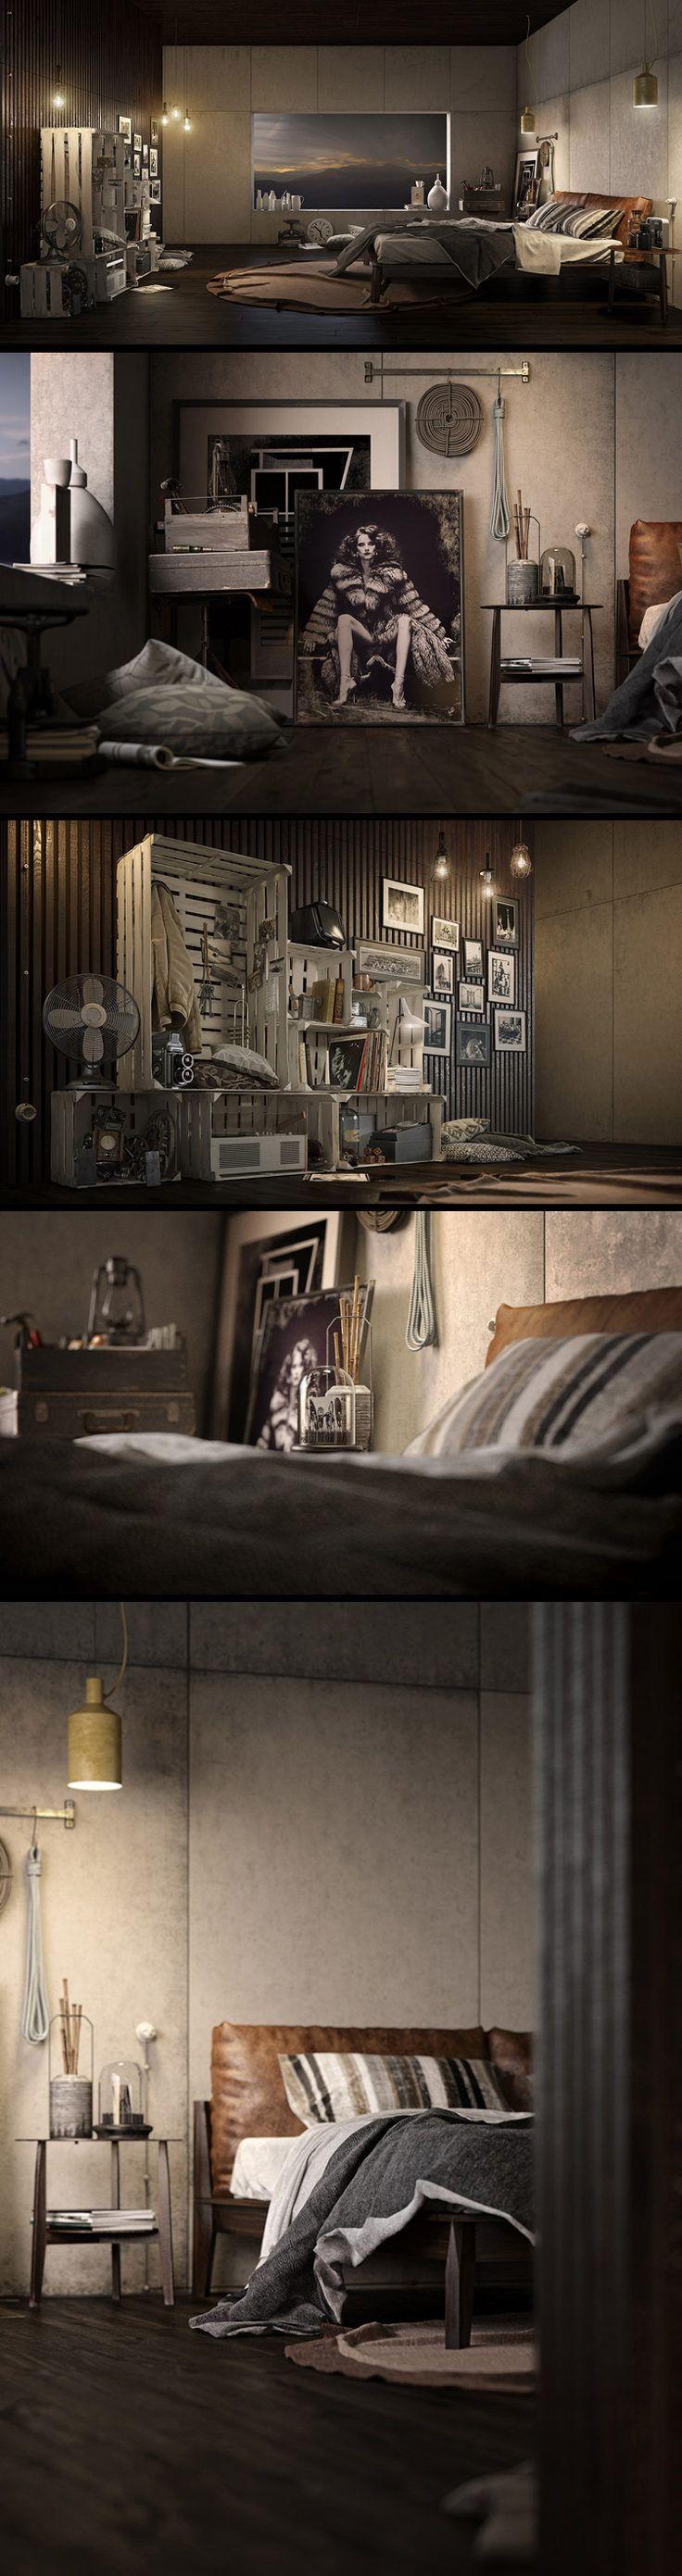 Perfect Day by U6 Studio